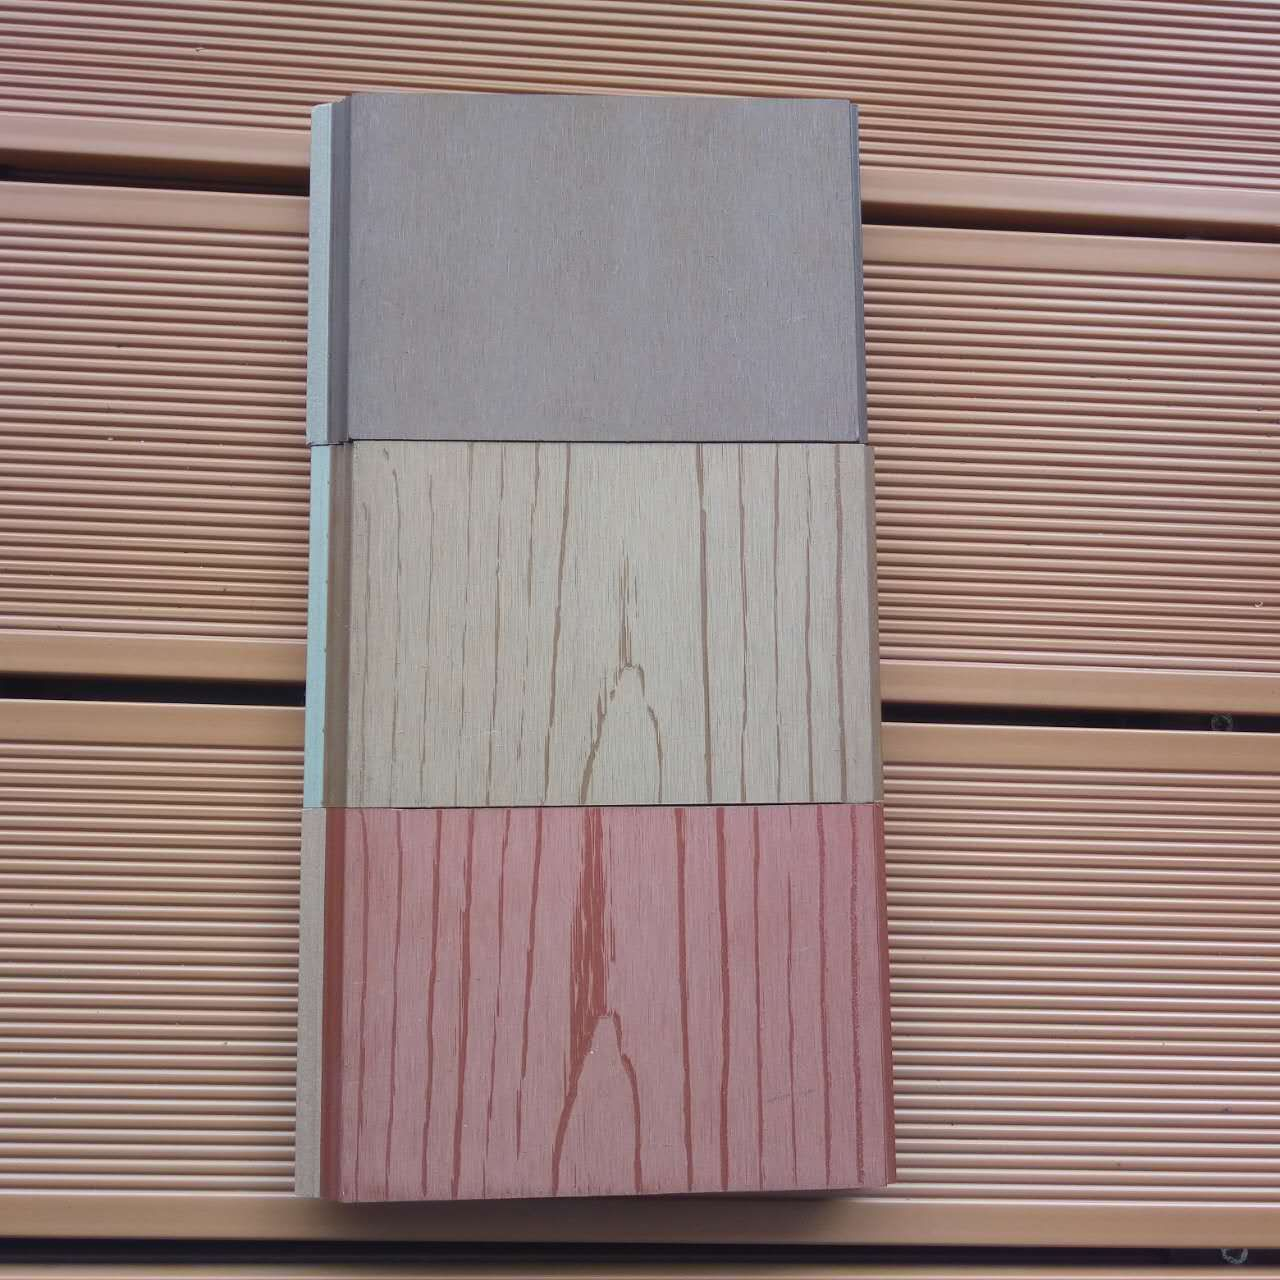 Plastic Exterior Wall Decorative Panel Fire Resistant Wood Plastic Composite Wall Board Wpcwallpanelex Wood Plastic Composite Wall Cladding Decorative Panels